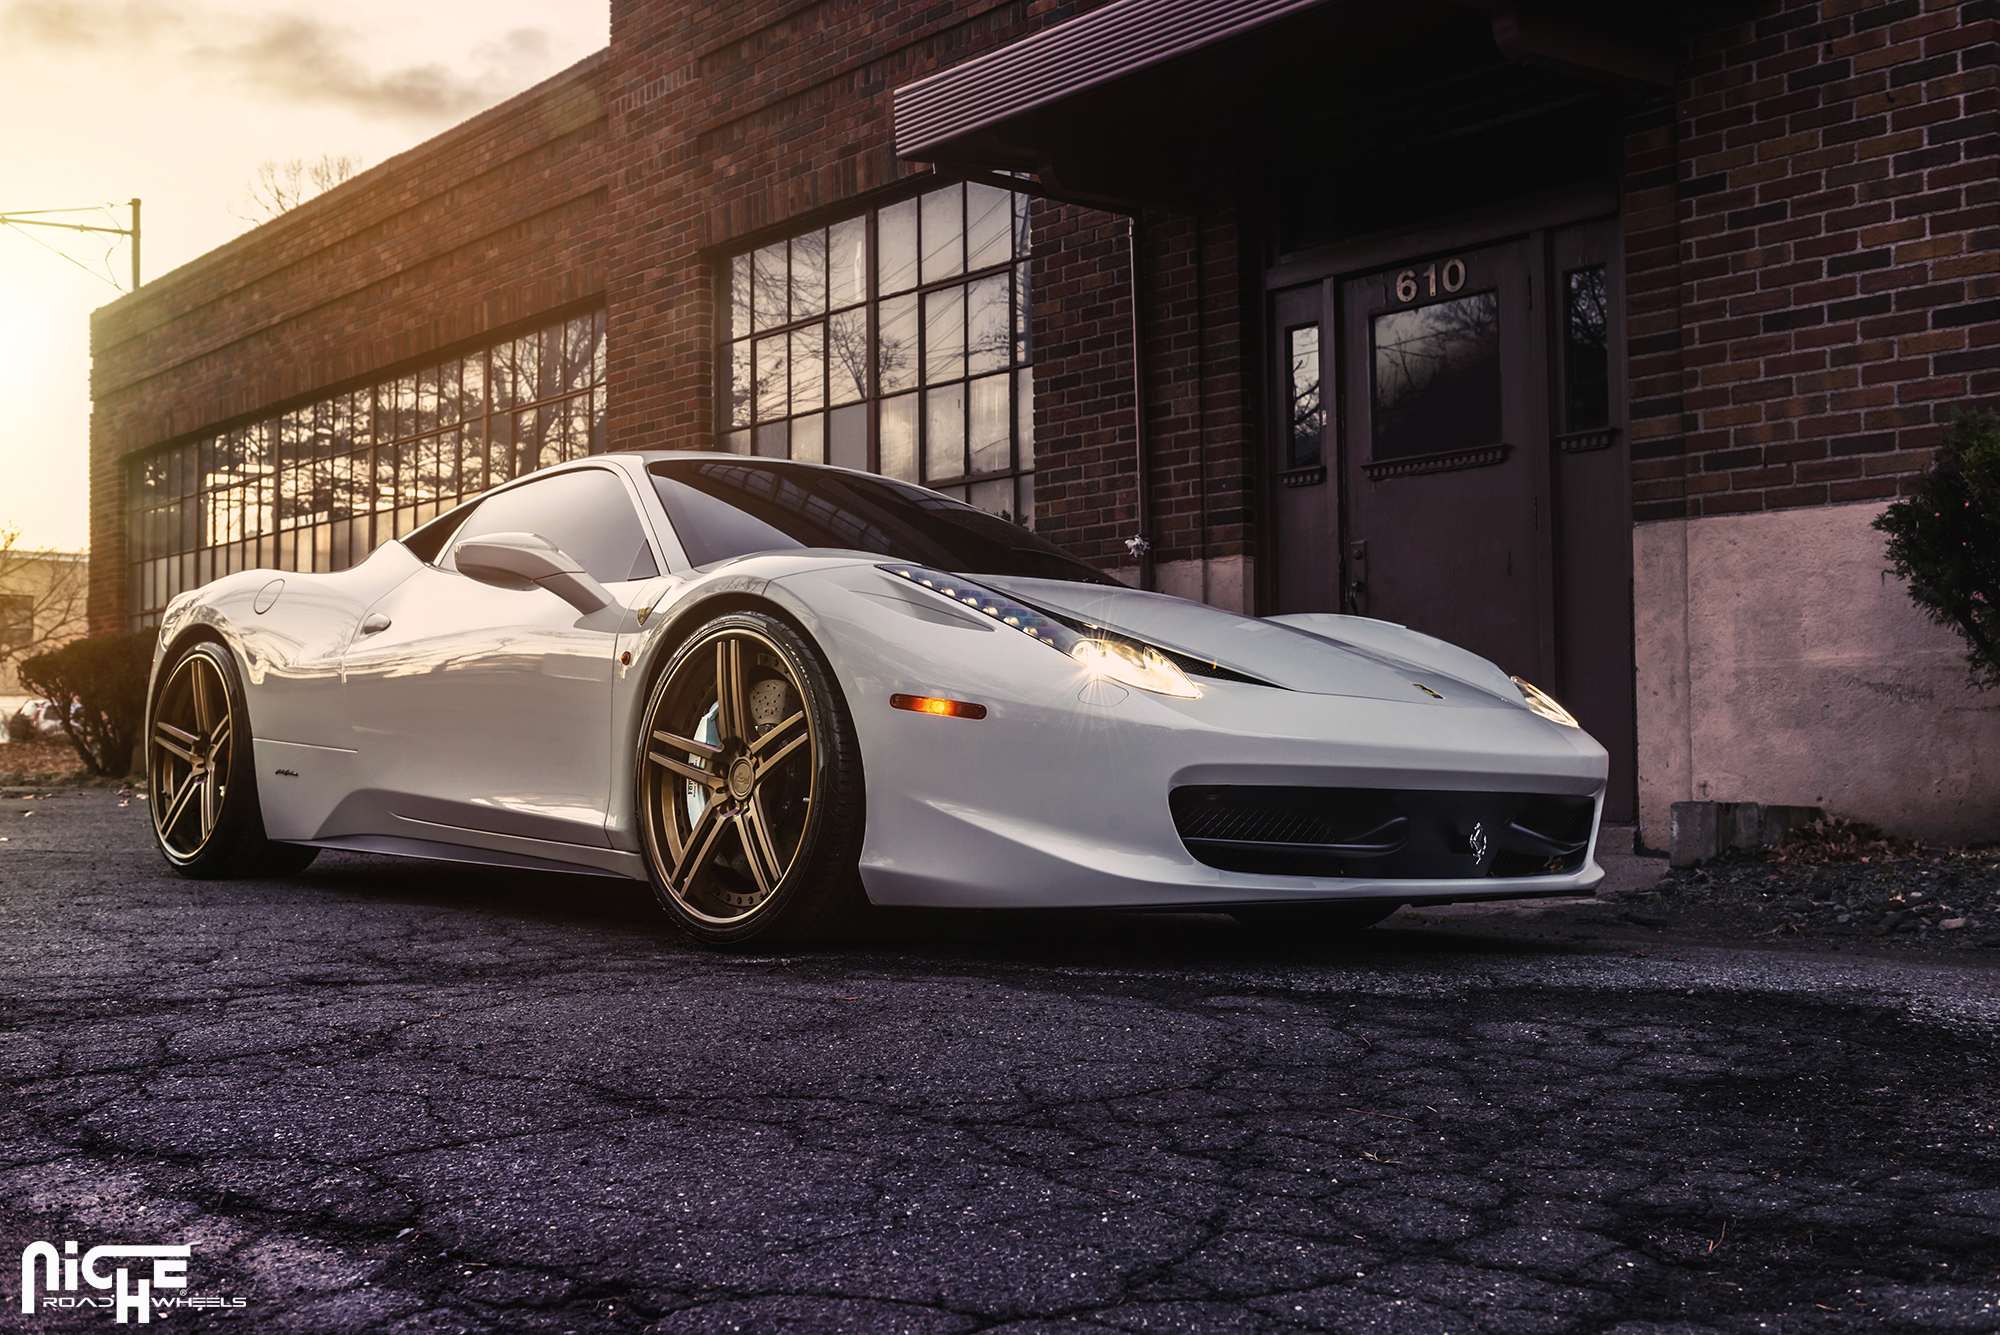 H90 | Niche Dromo | Ferrari 458